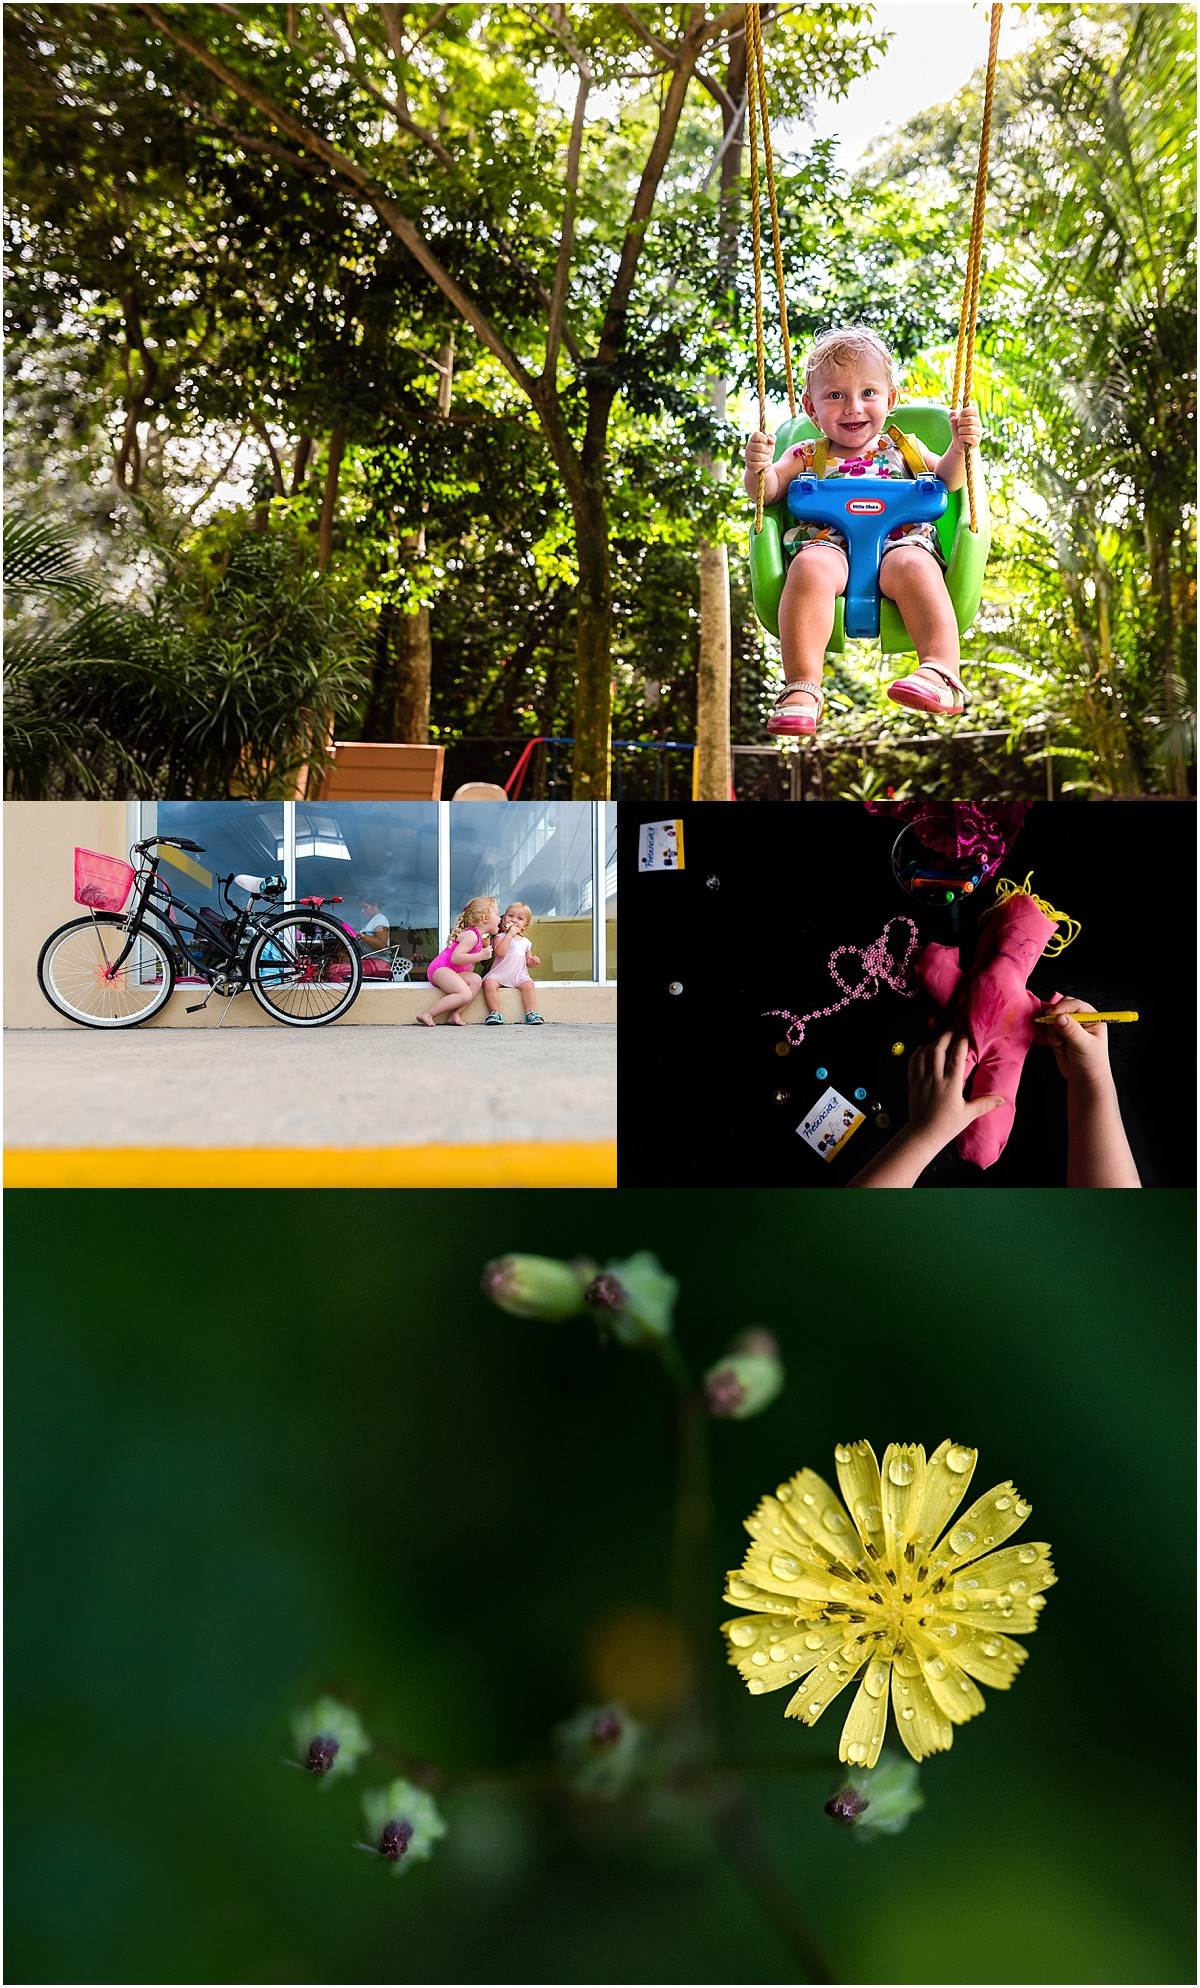 Ashley_Rogers_Photography_South_Florida_Photographer_Orlando_Photographer_Costa_Rica_Photographer_1228.jpg